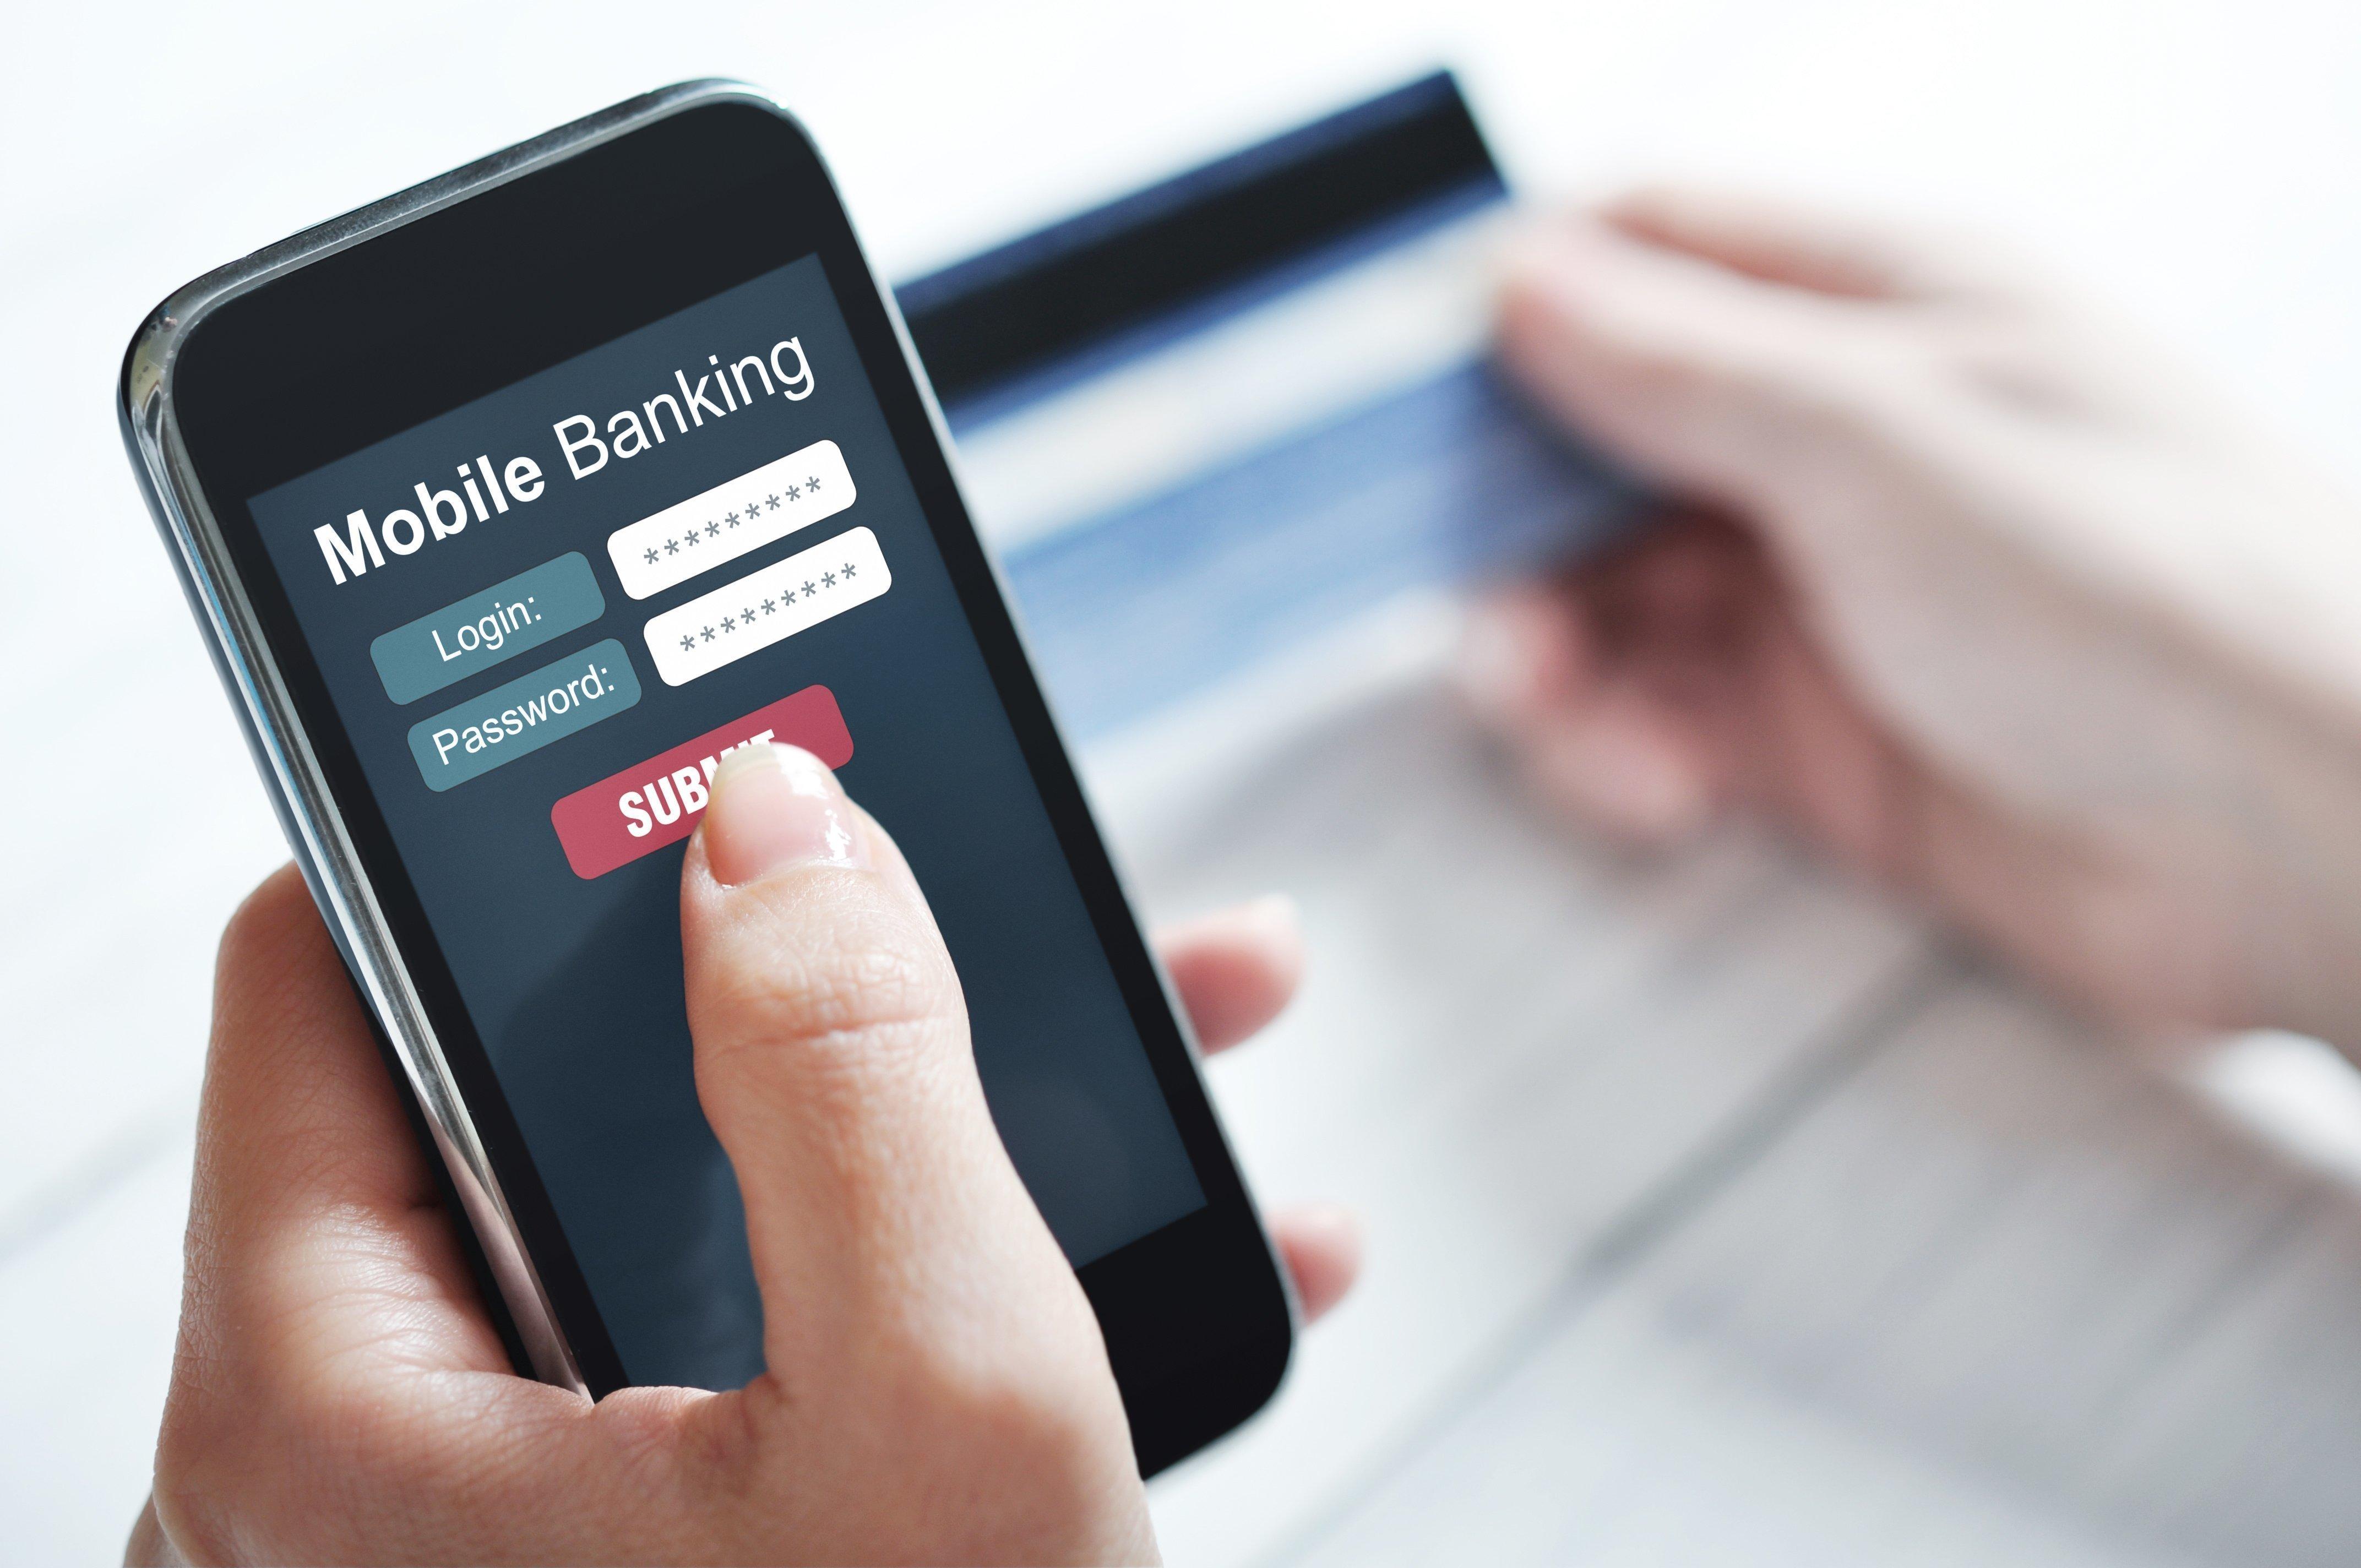 MVNO Lebara deploys Huawei digital wallet for mobile services